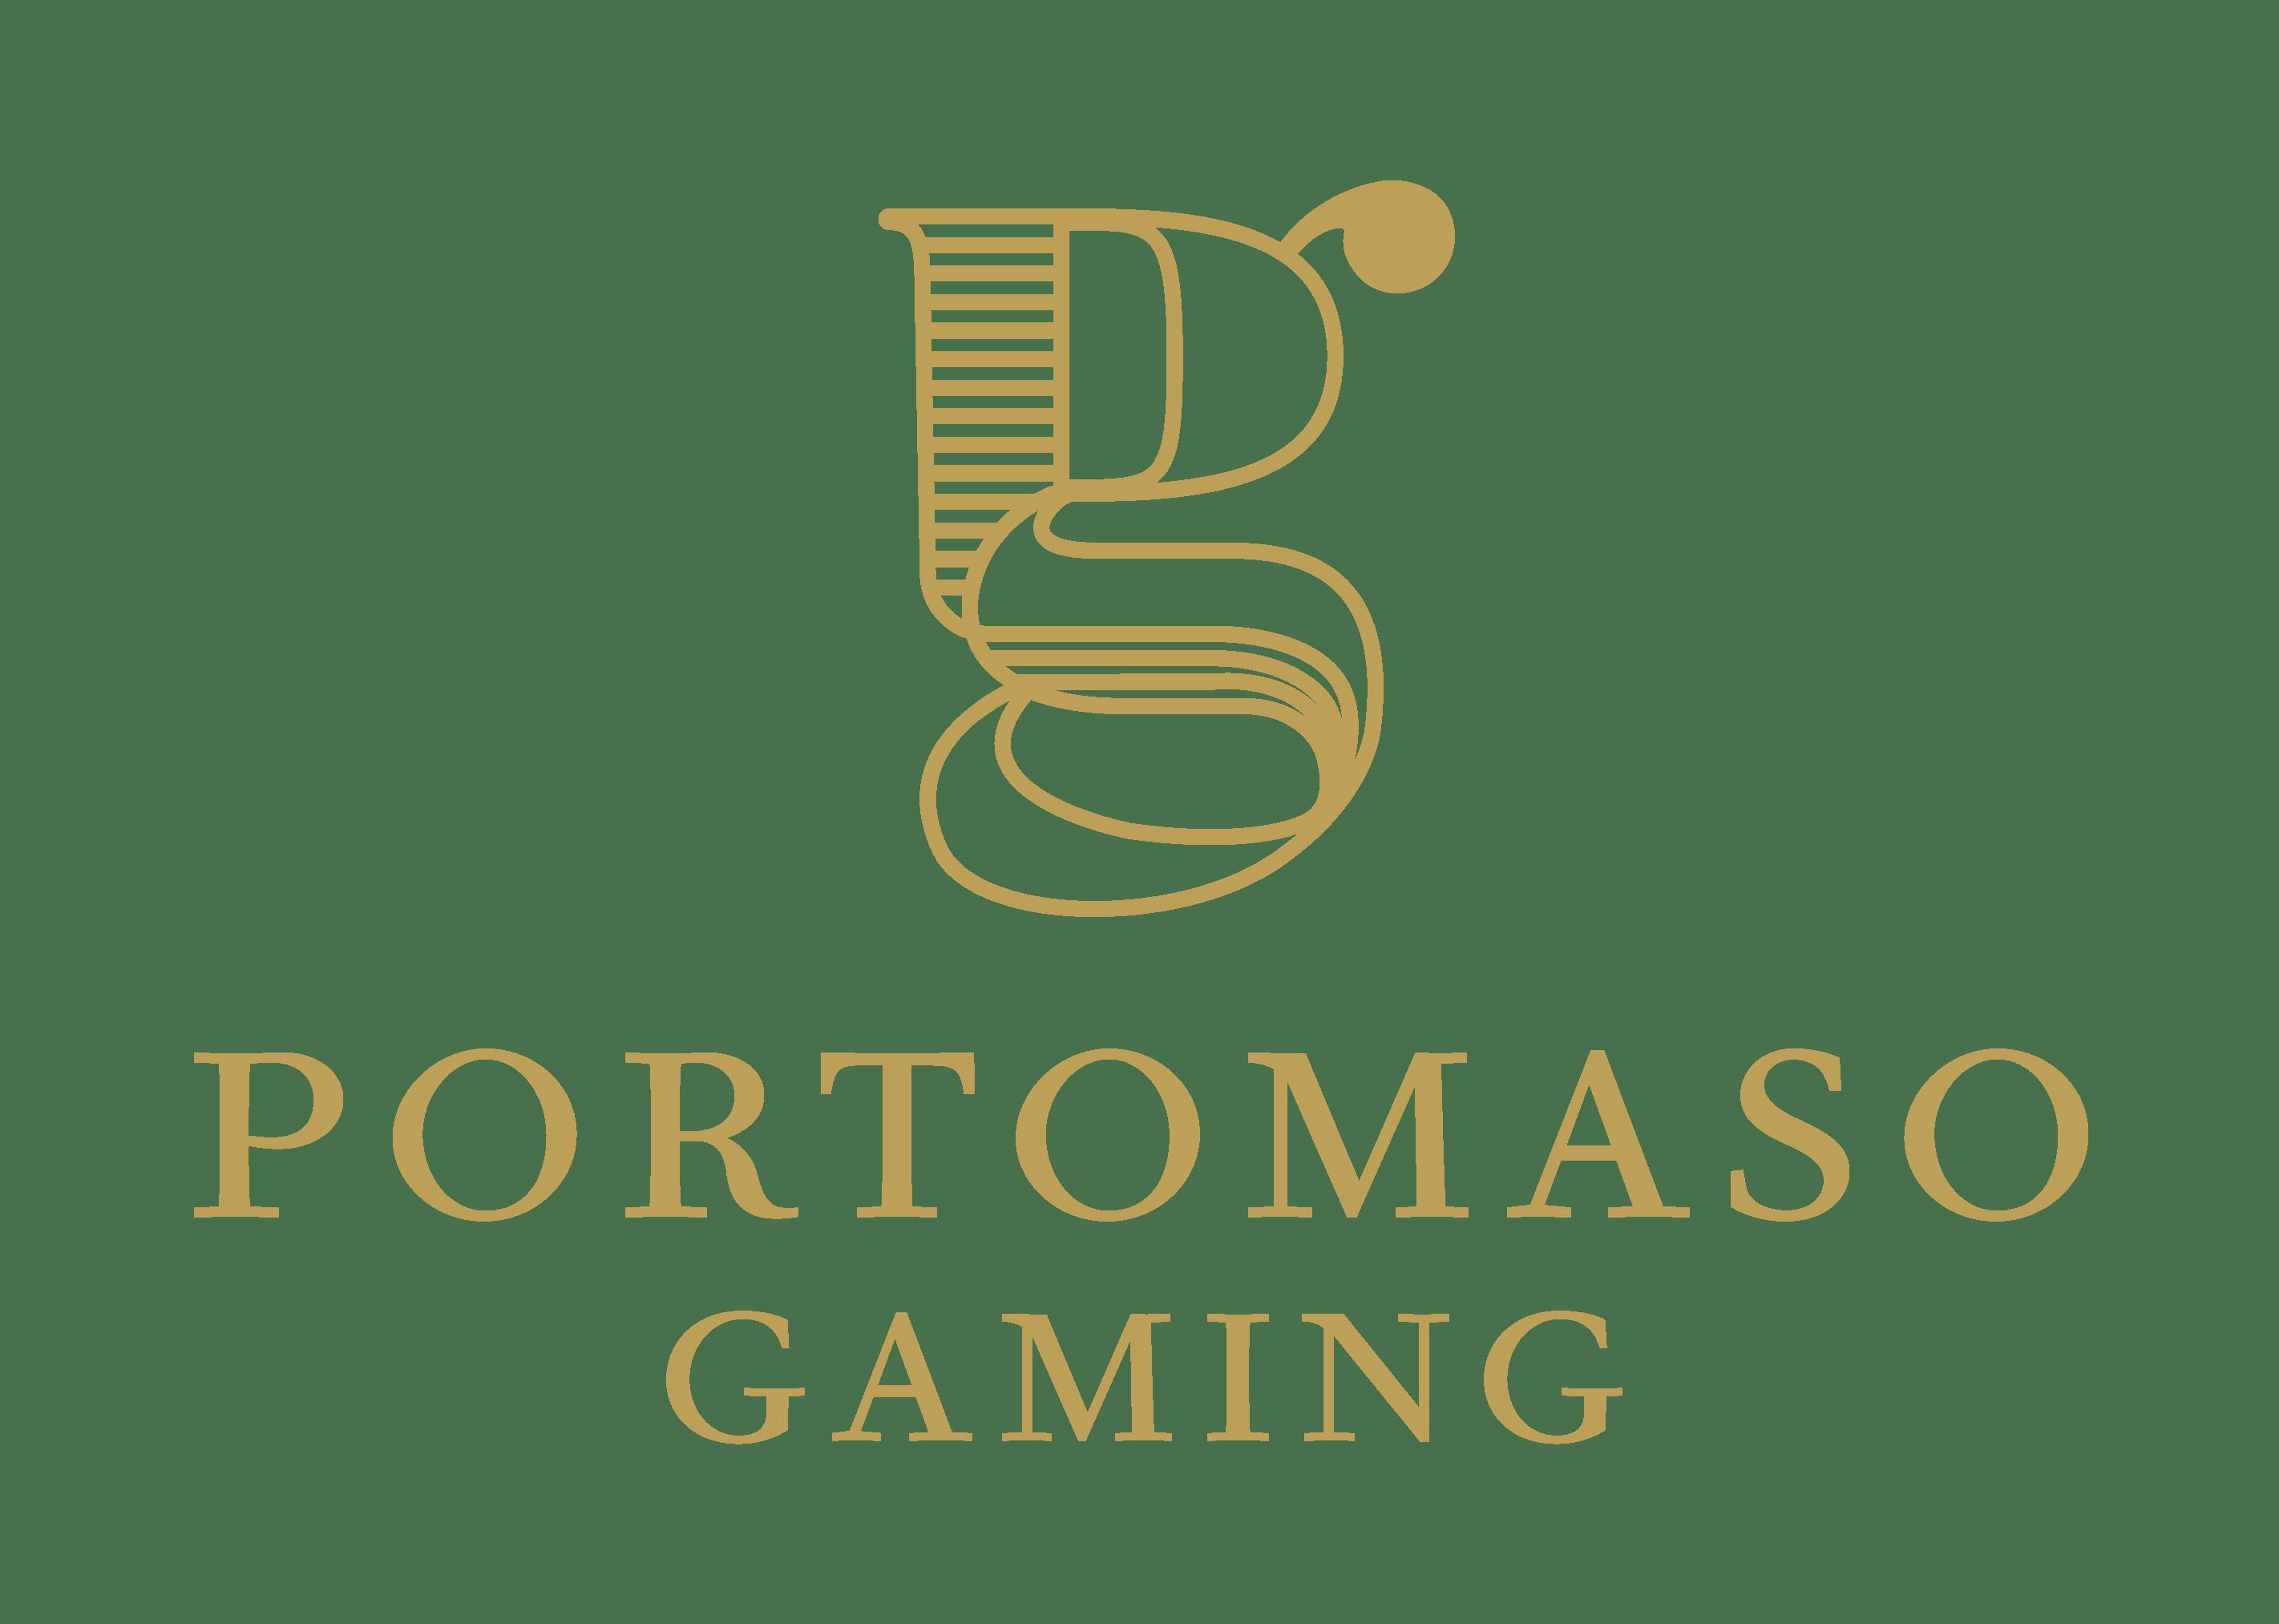 Portomaso Gaming giochi